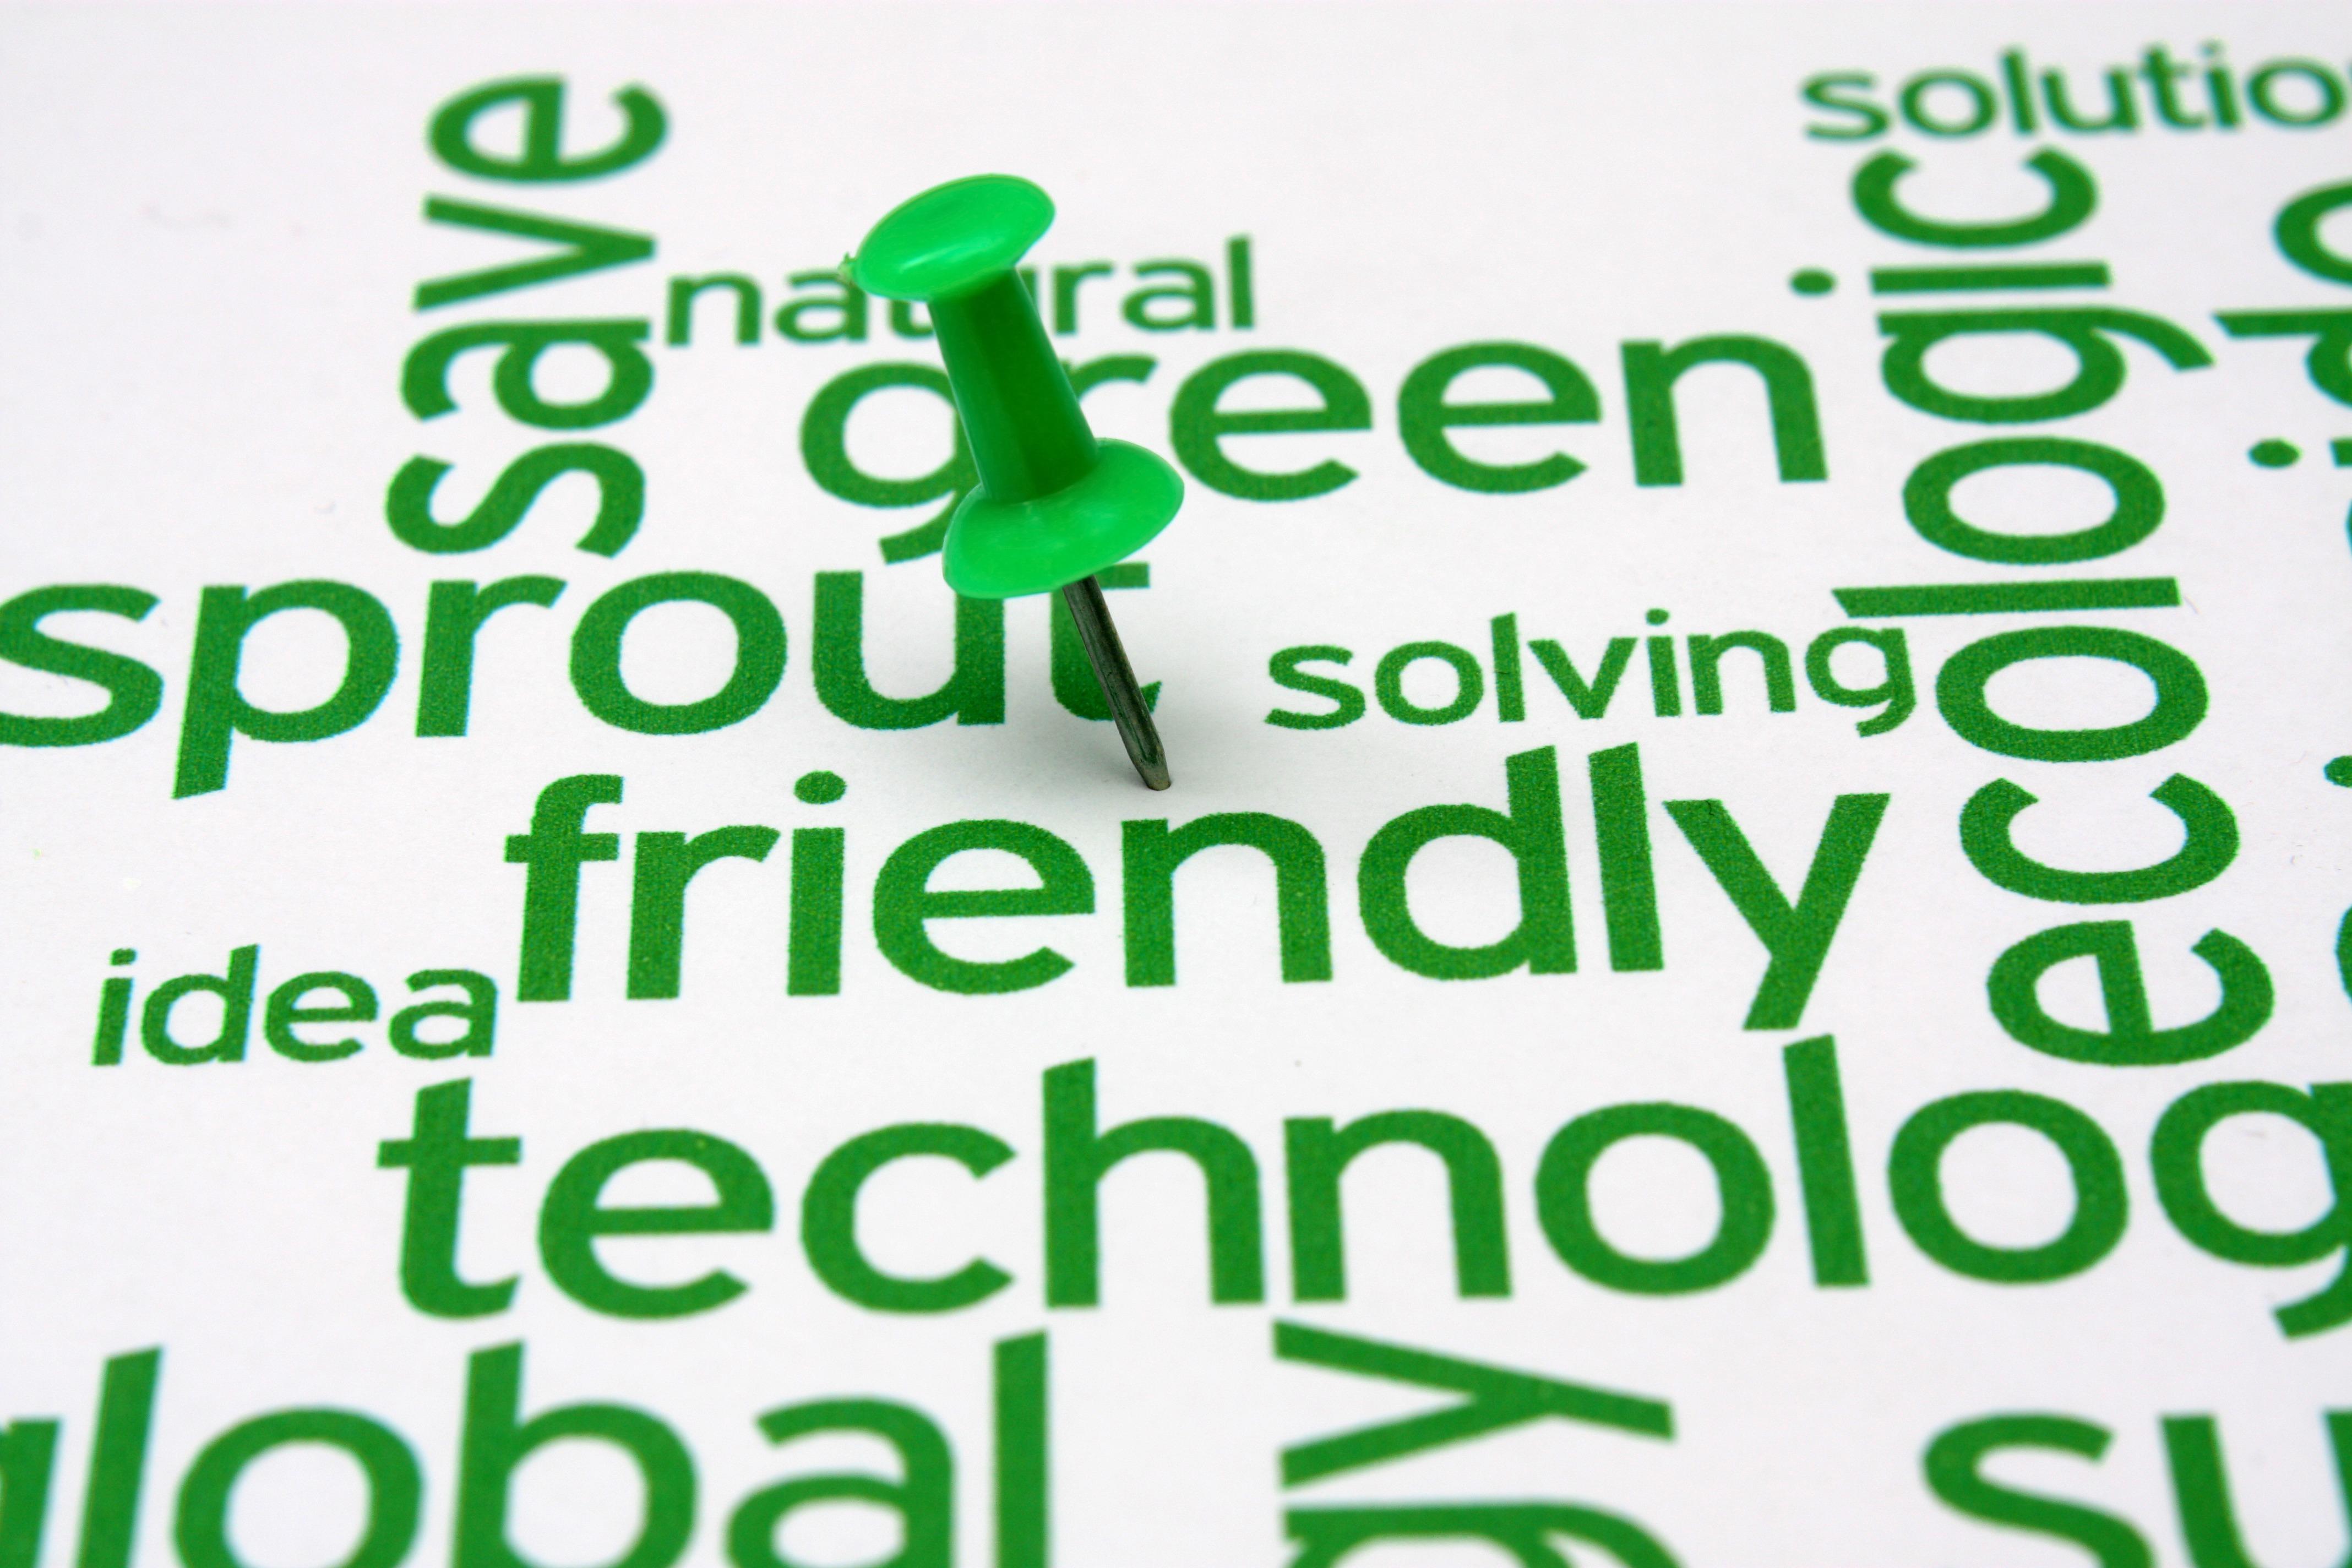 friendly-technology_Gy66vOv_.jpg